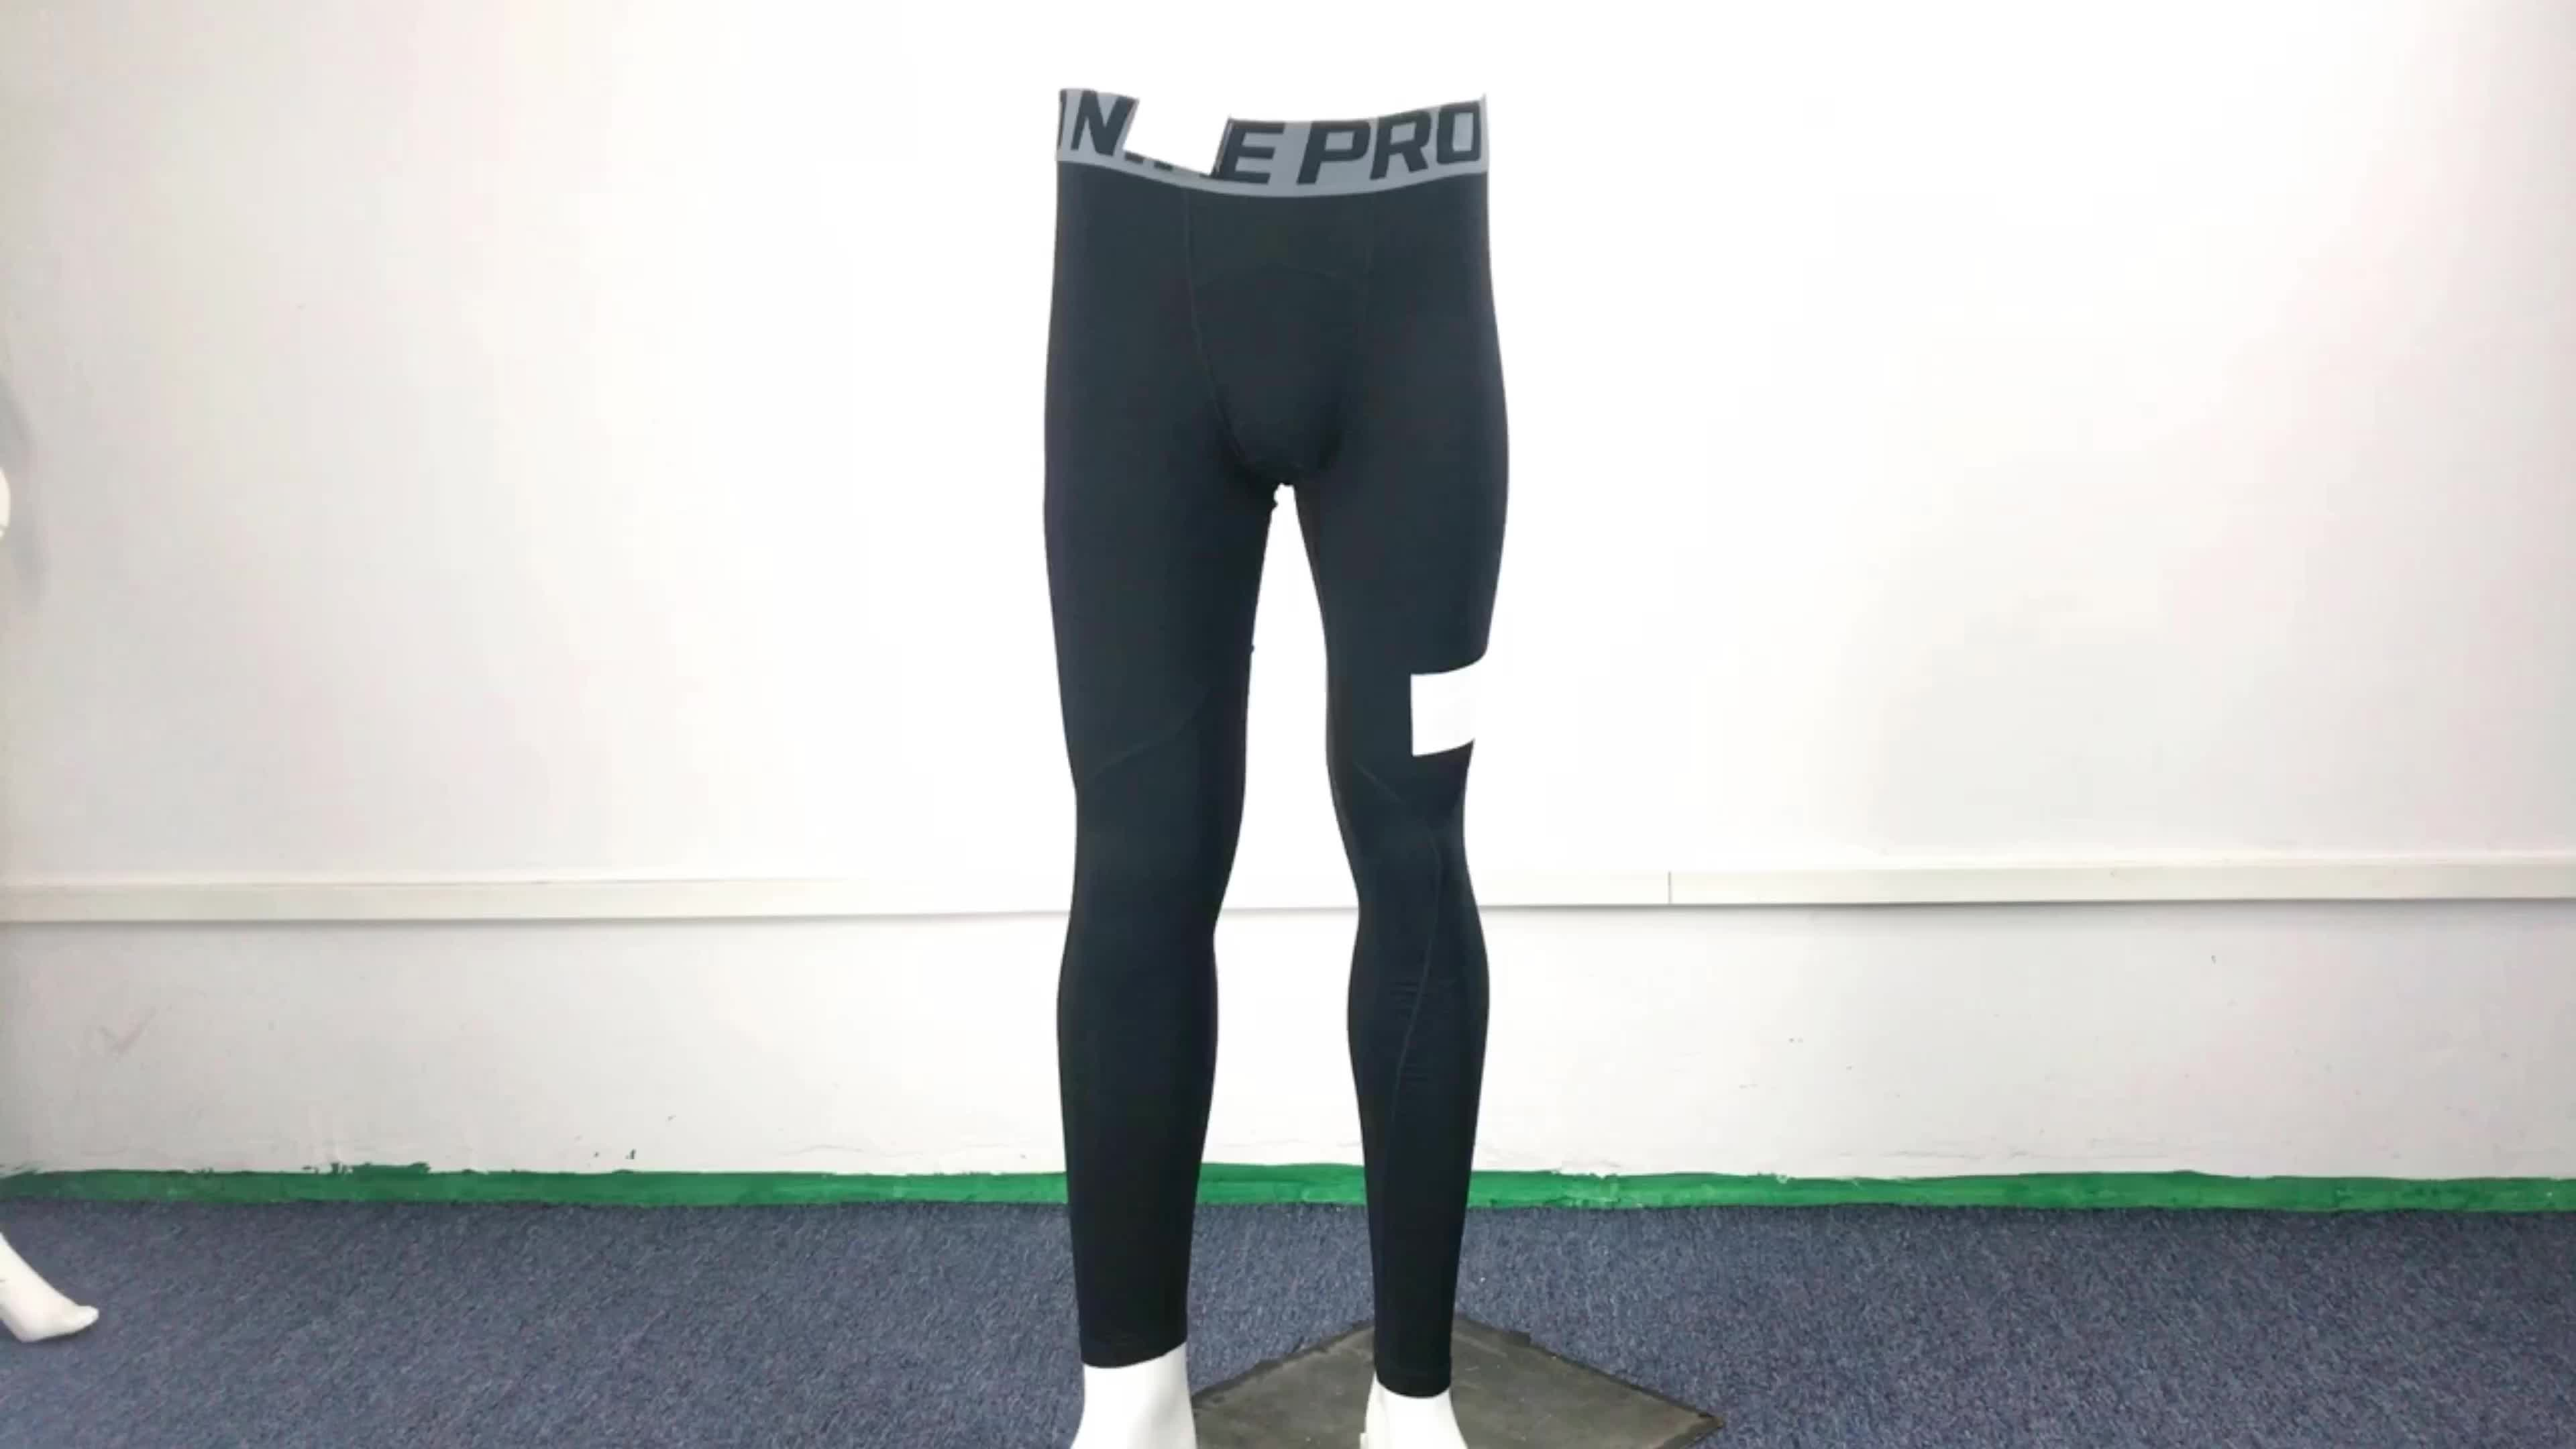 Baru Dirancang Pria Kebugaran Celana Kustom Kosong Fashion Celana Jogger